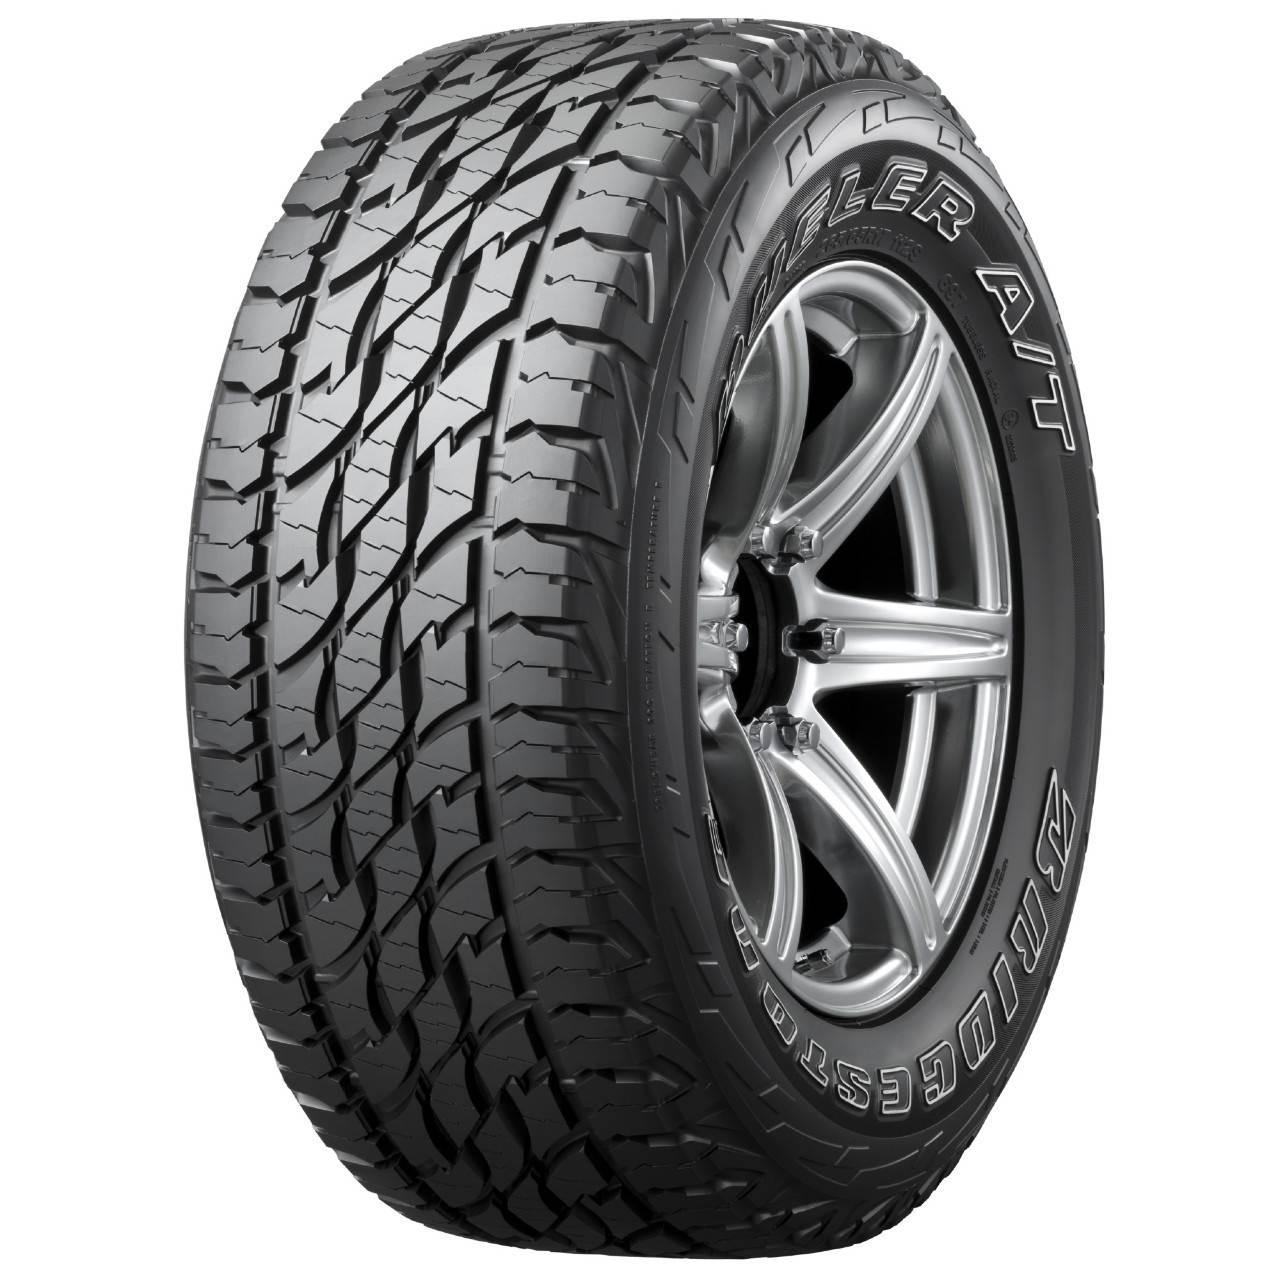 Bridgestone DUELER A/T D697